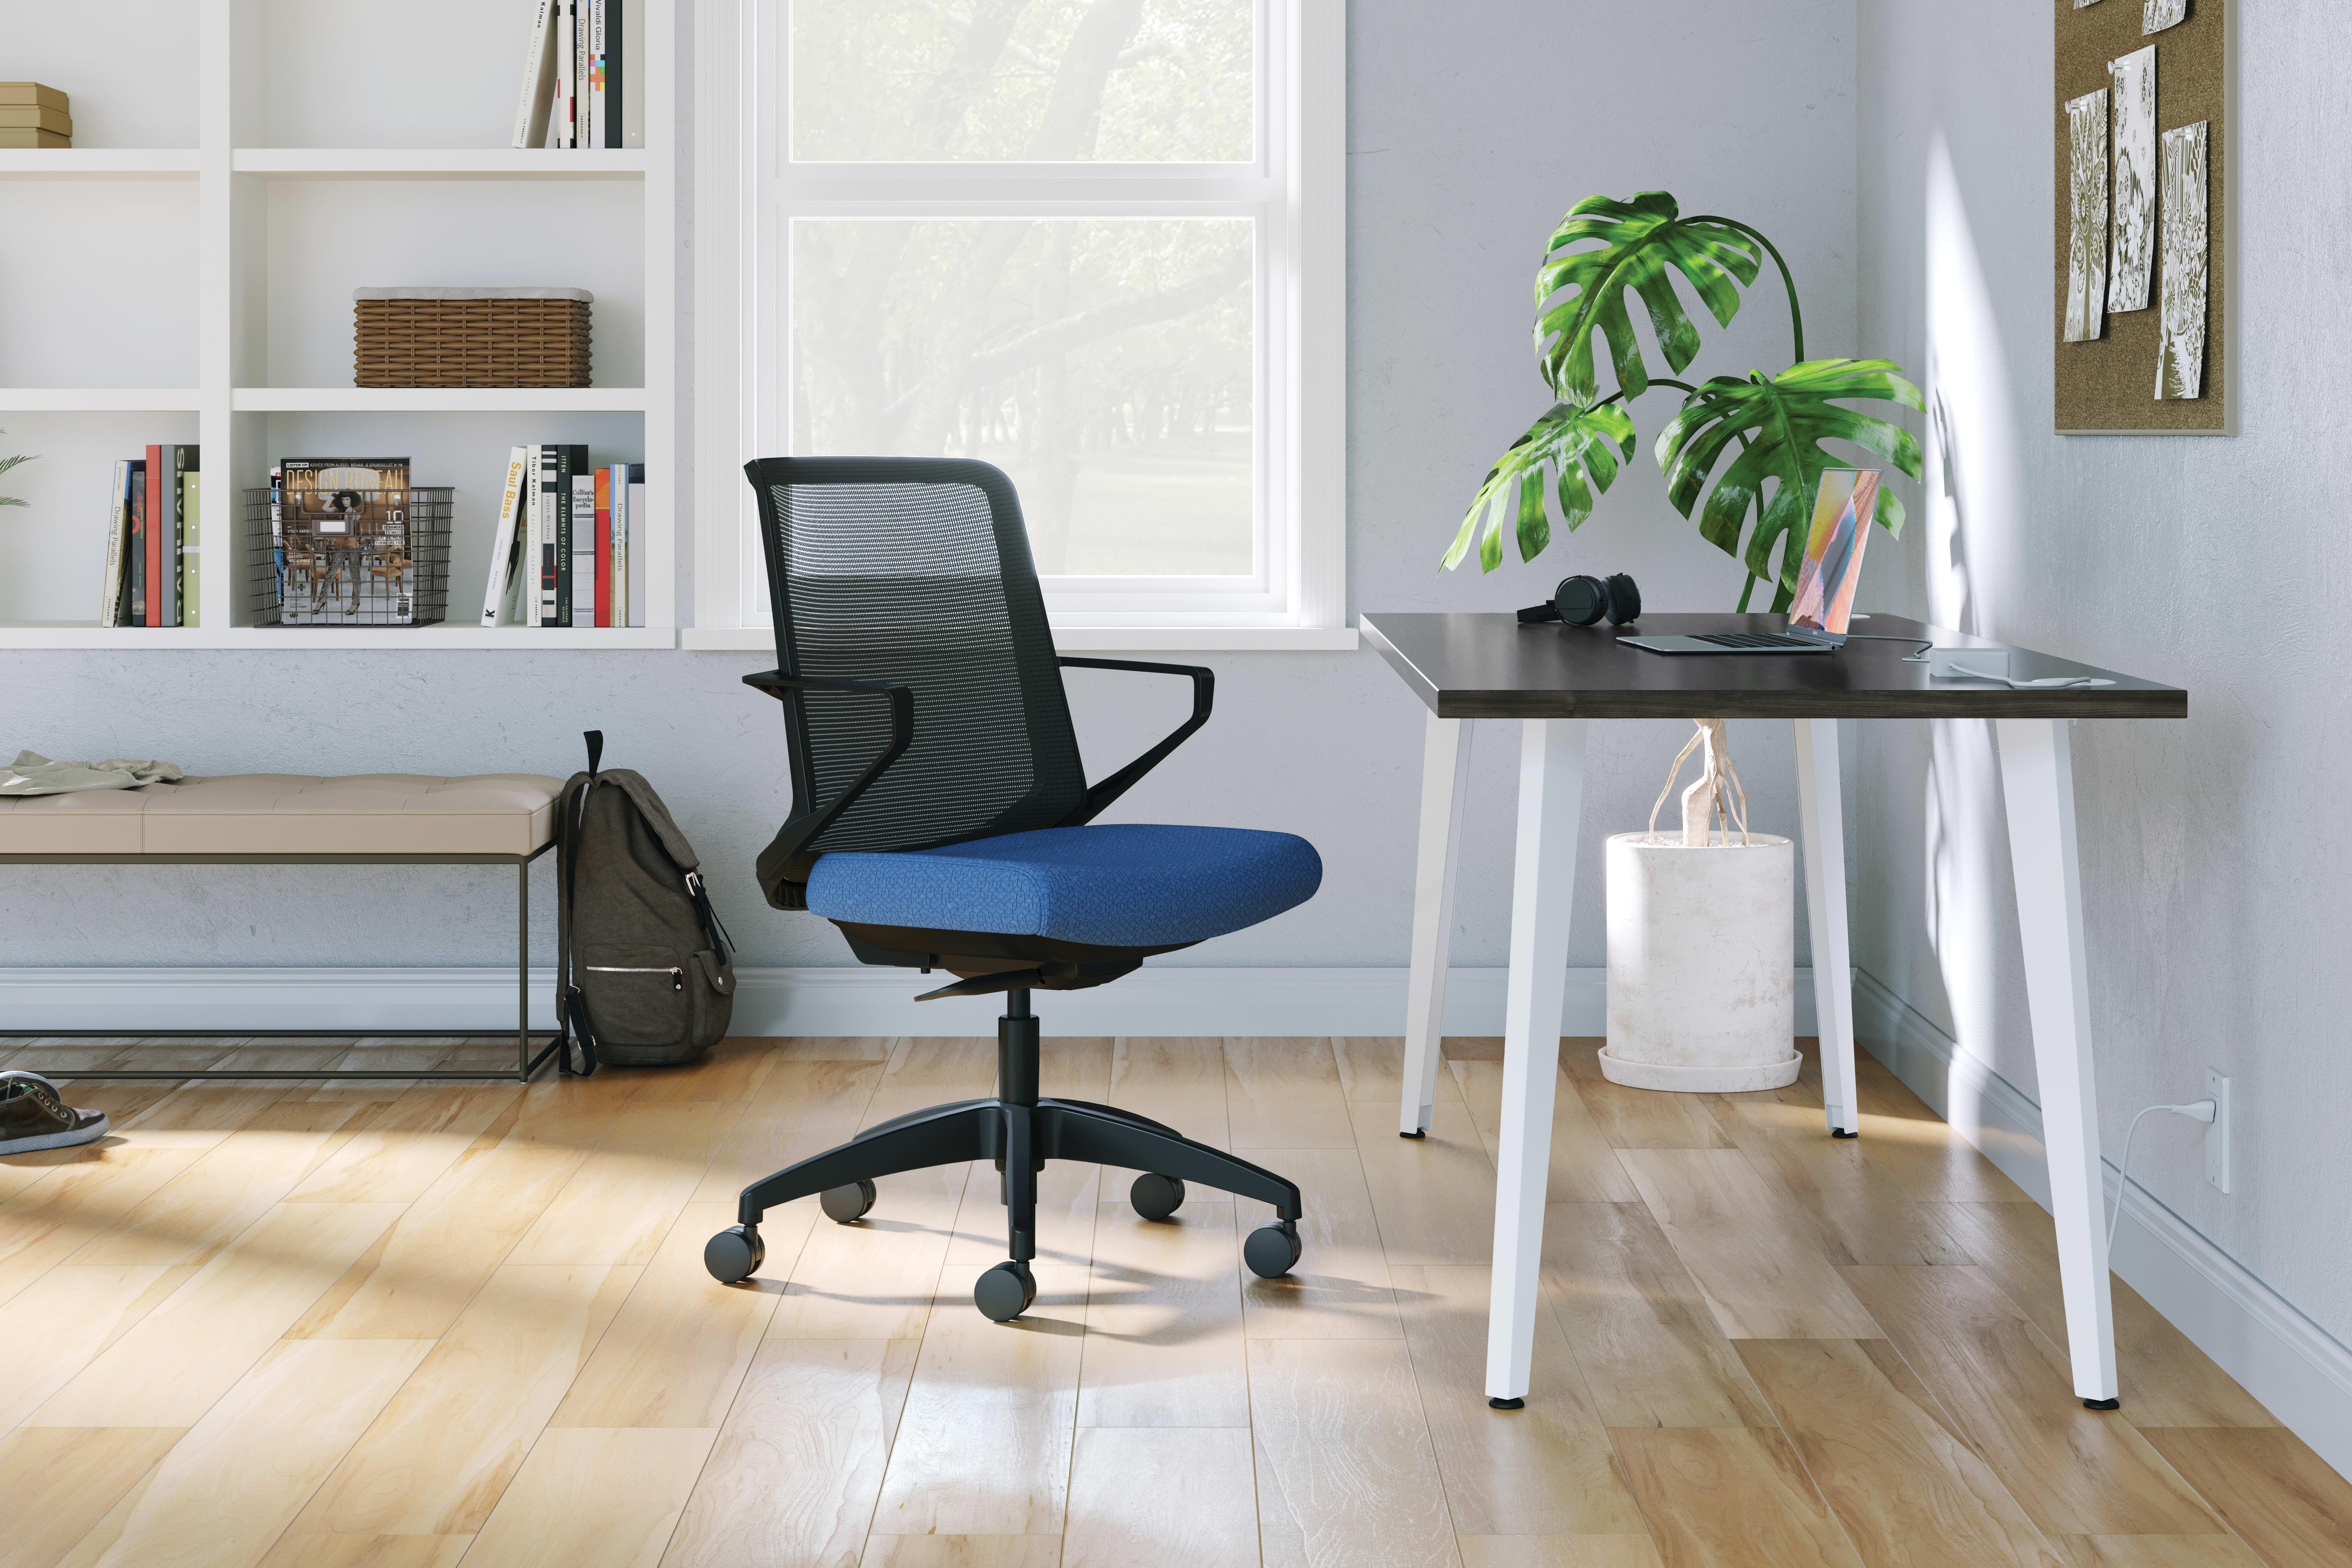 Cliq Seating and Voi Desks